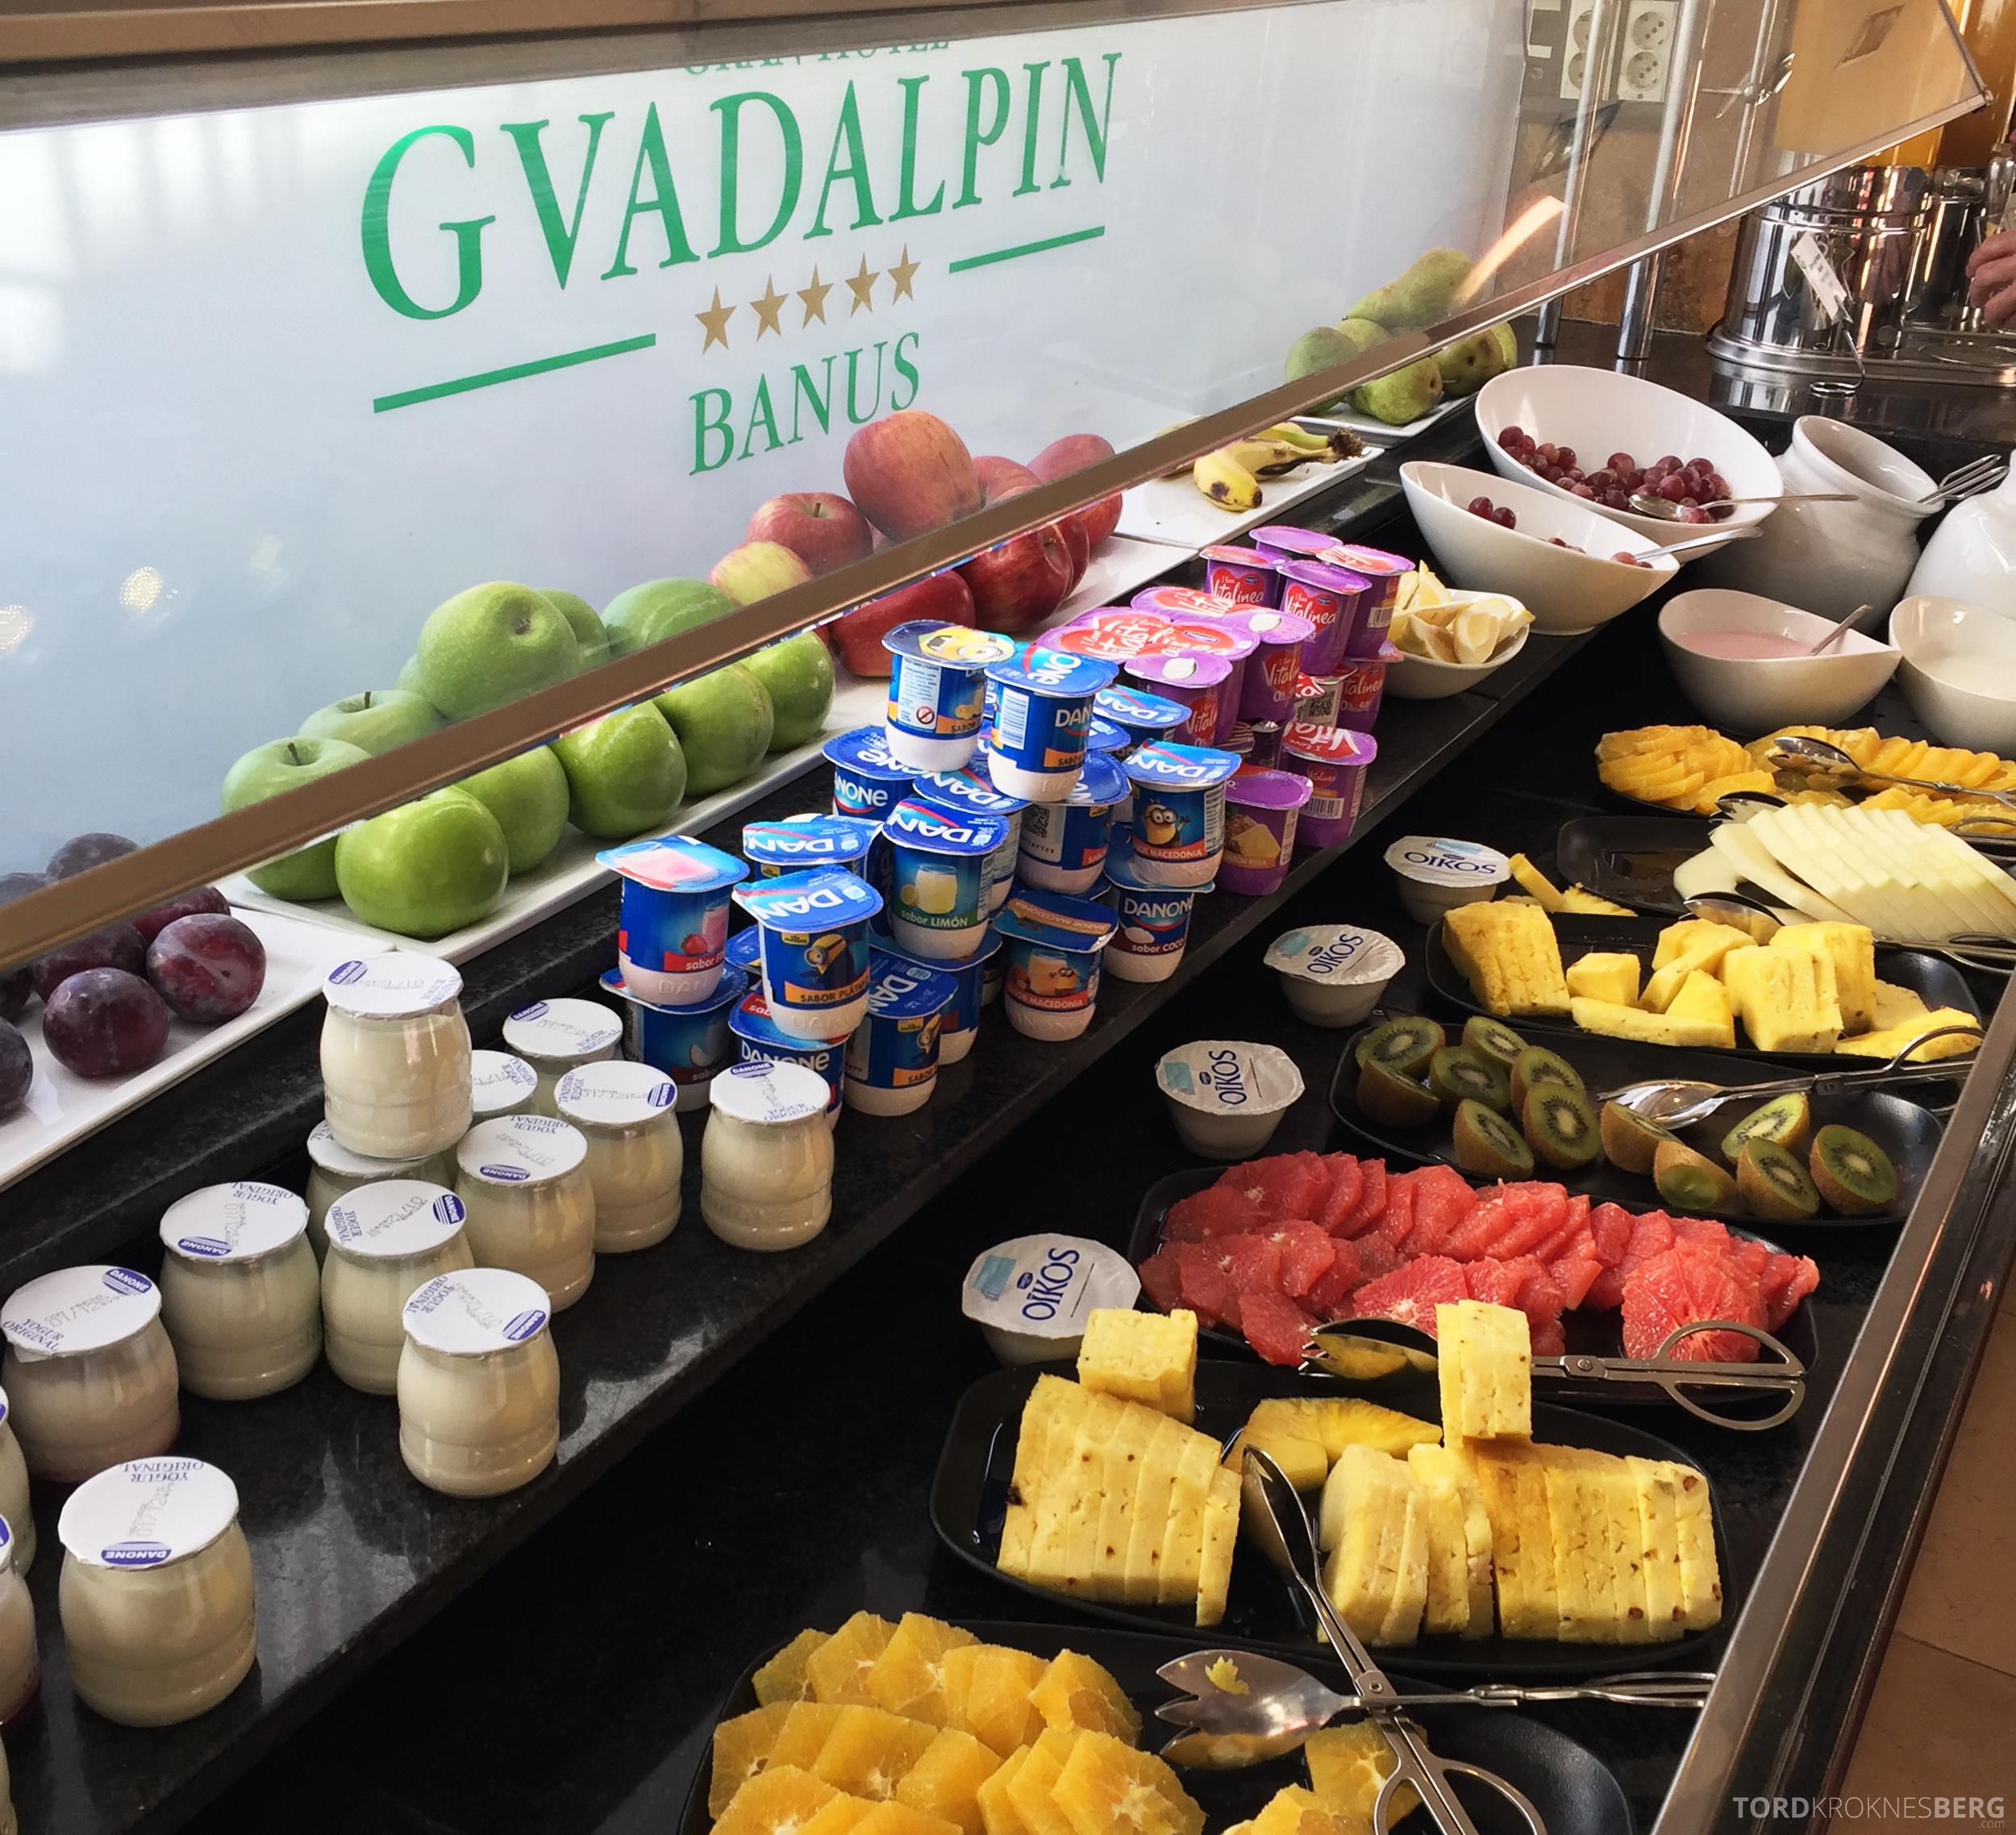 Gran Hotel Guadalpin Banus Marbella frokostbuffet frukt